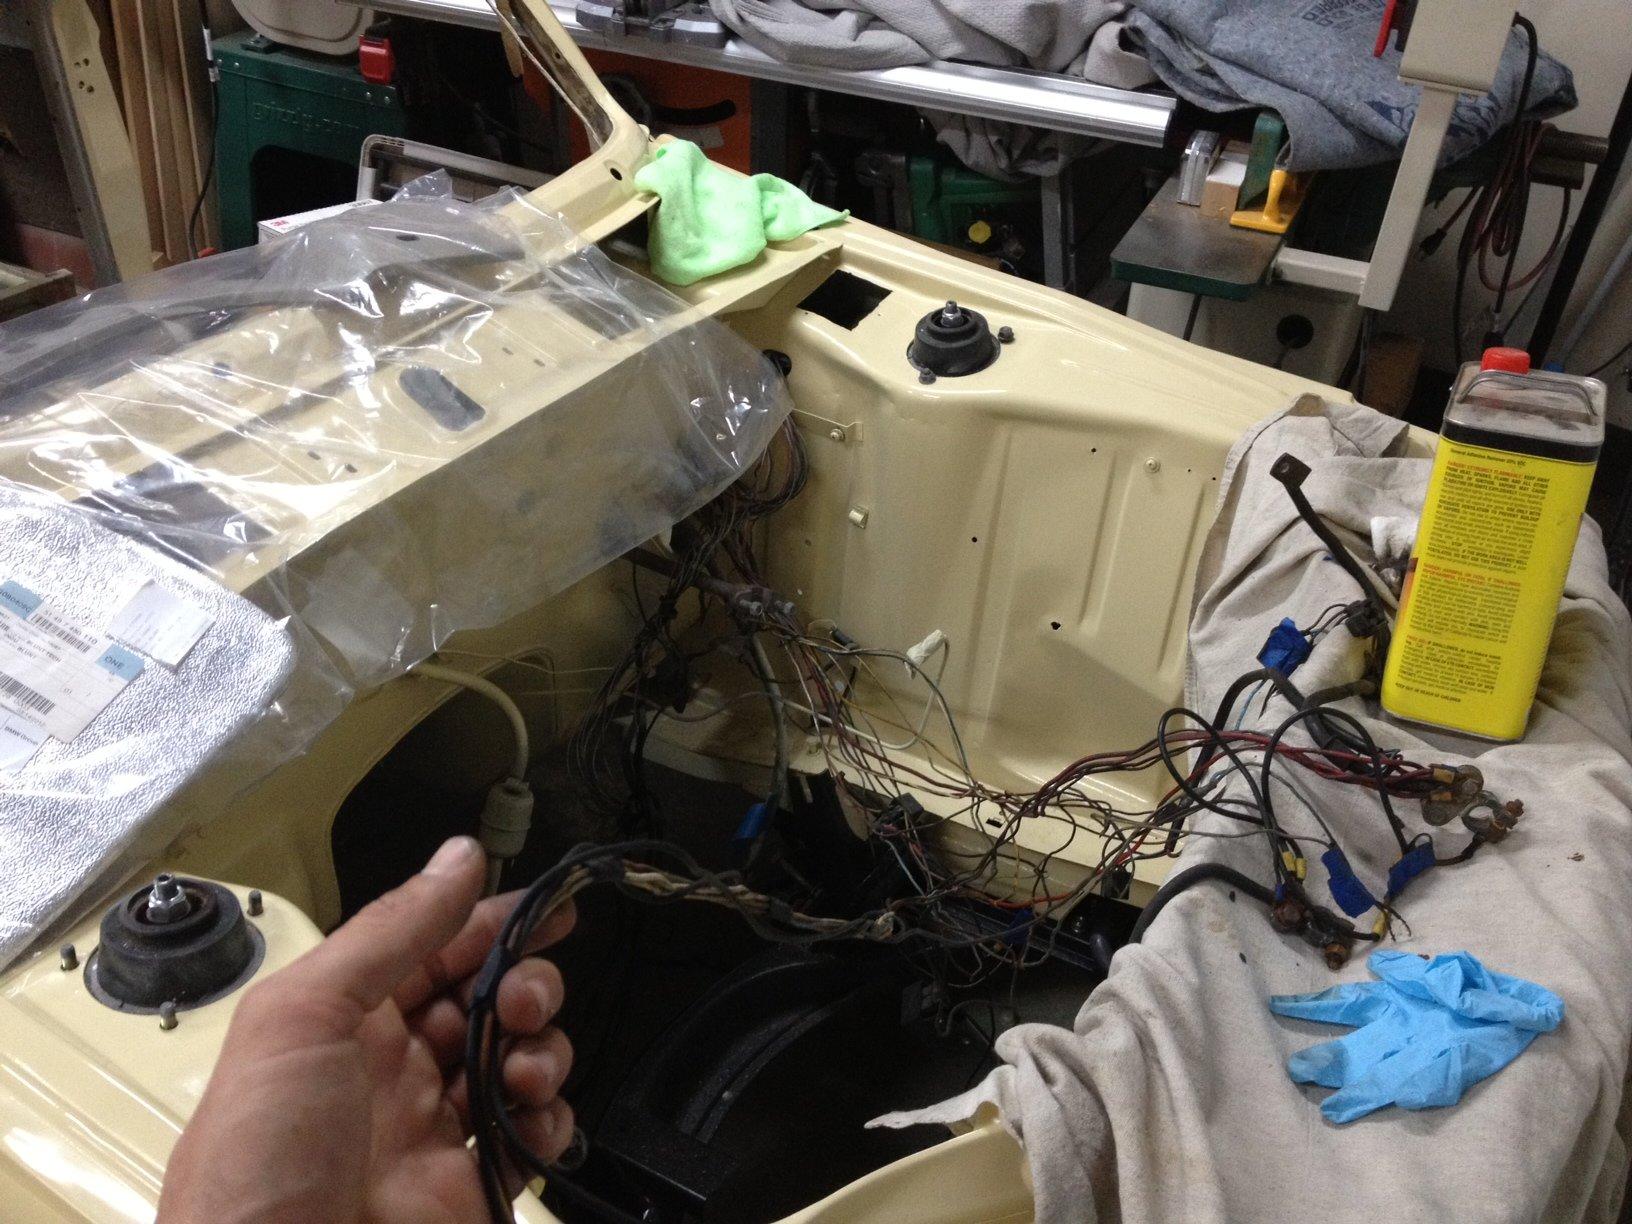 bmw 2002 wiring harness all wiring diagram Car Wiring Harness